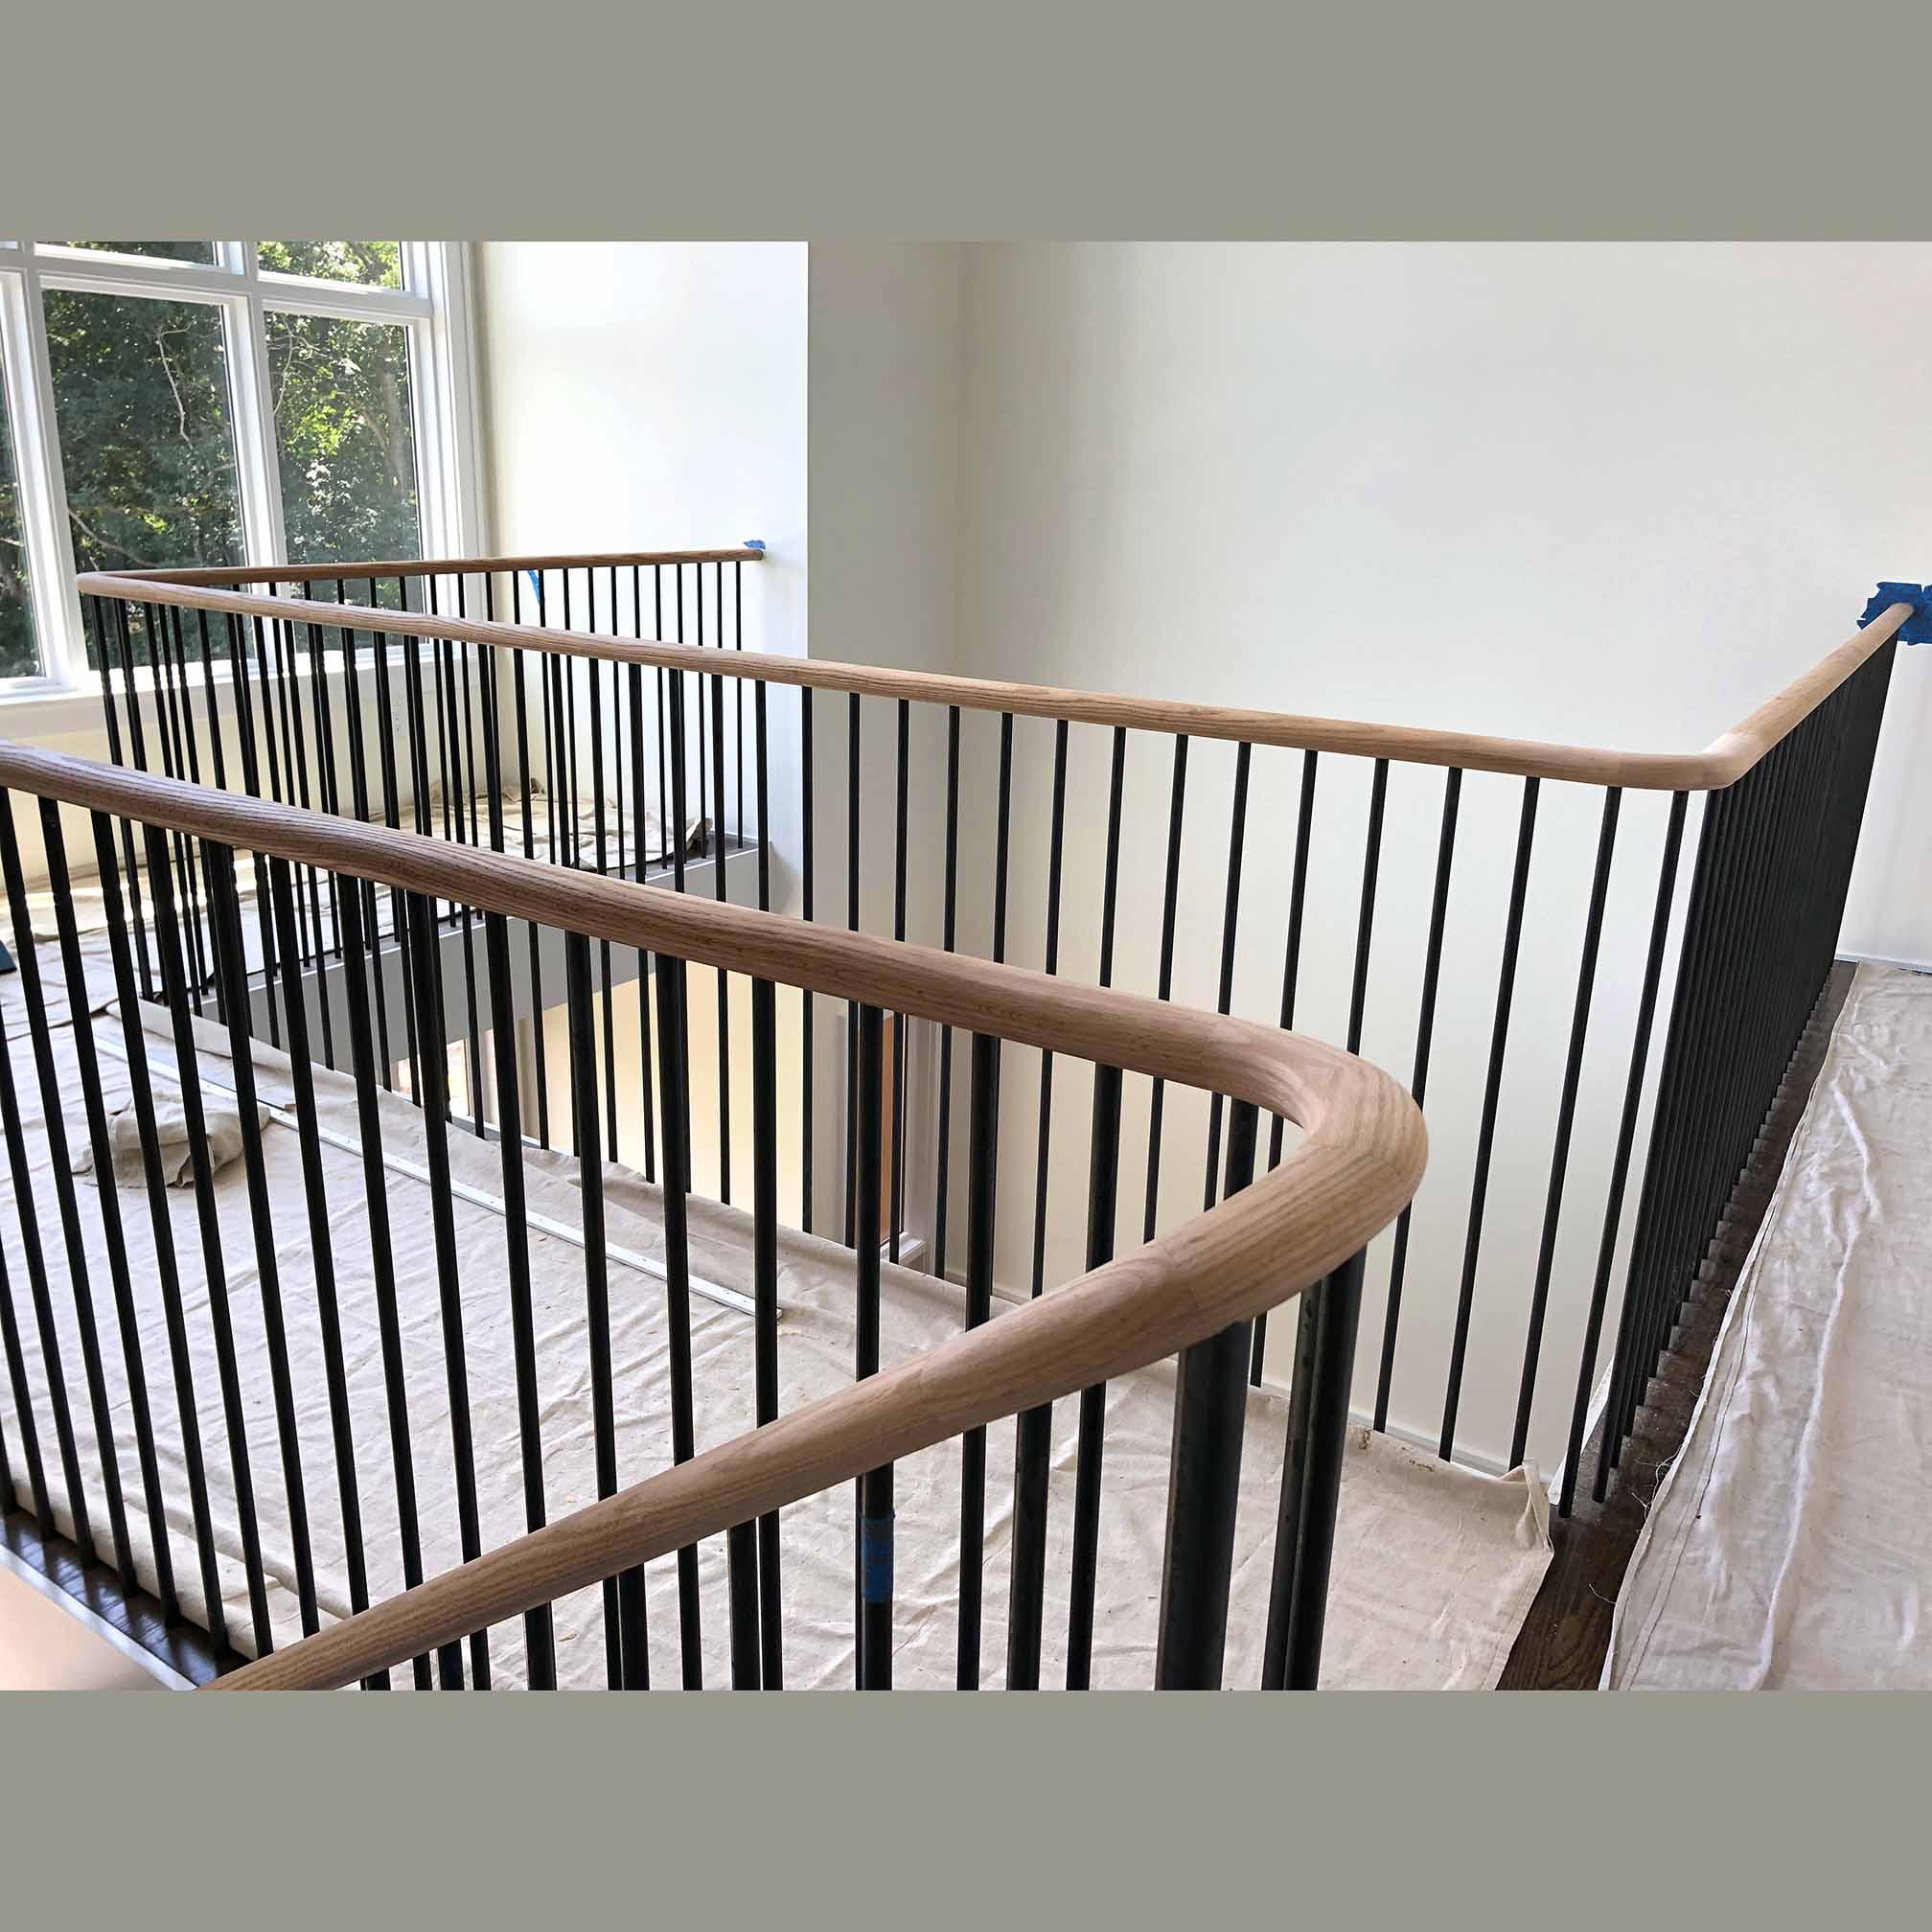 handrail_3.jpg